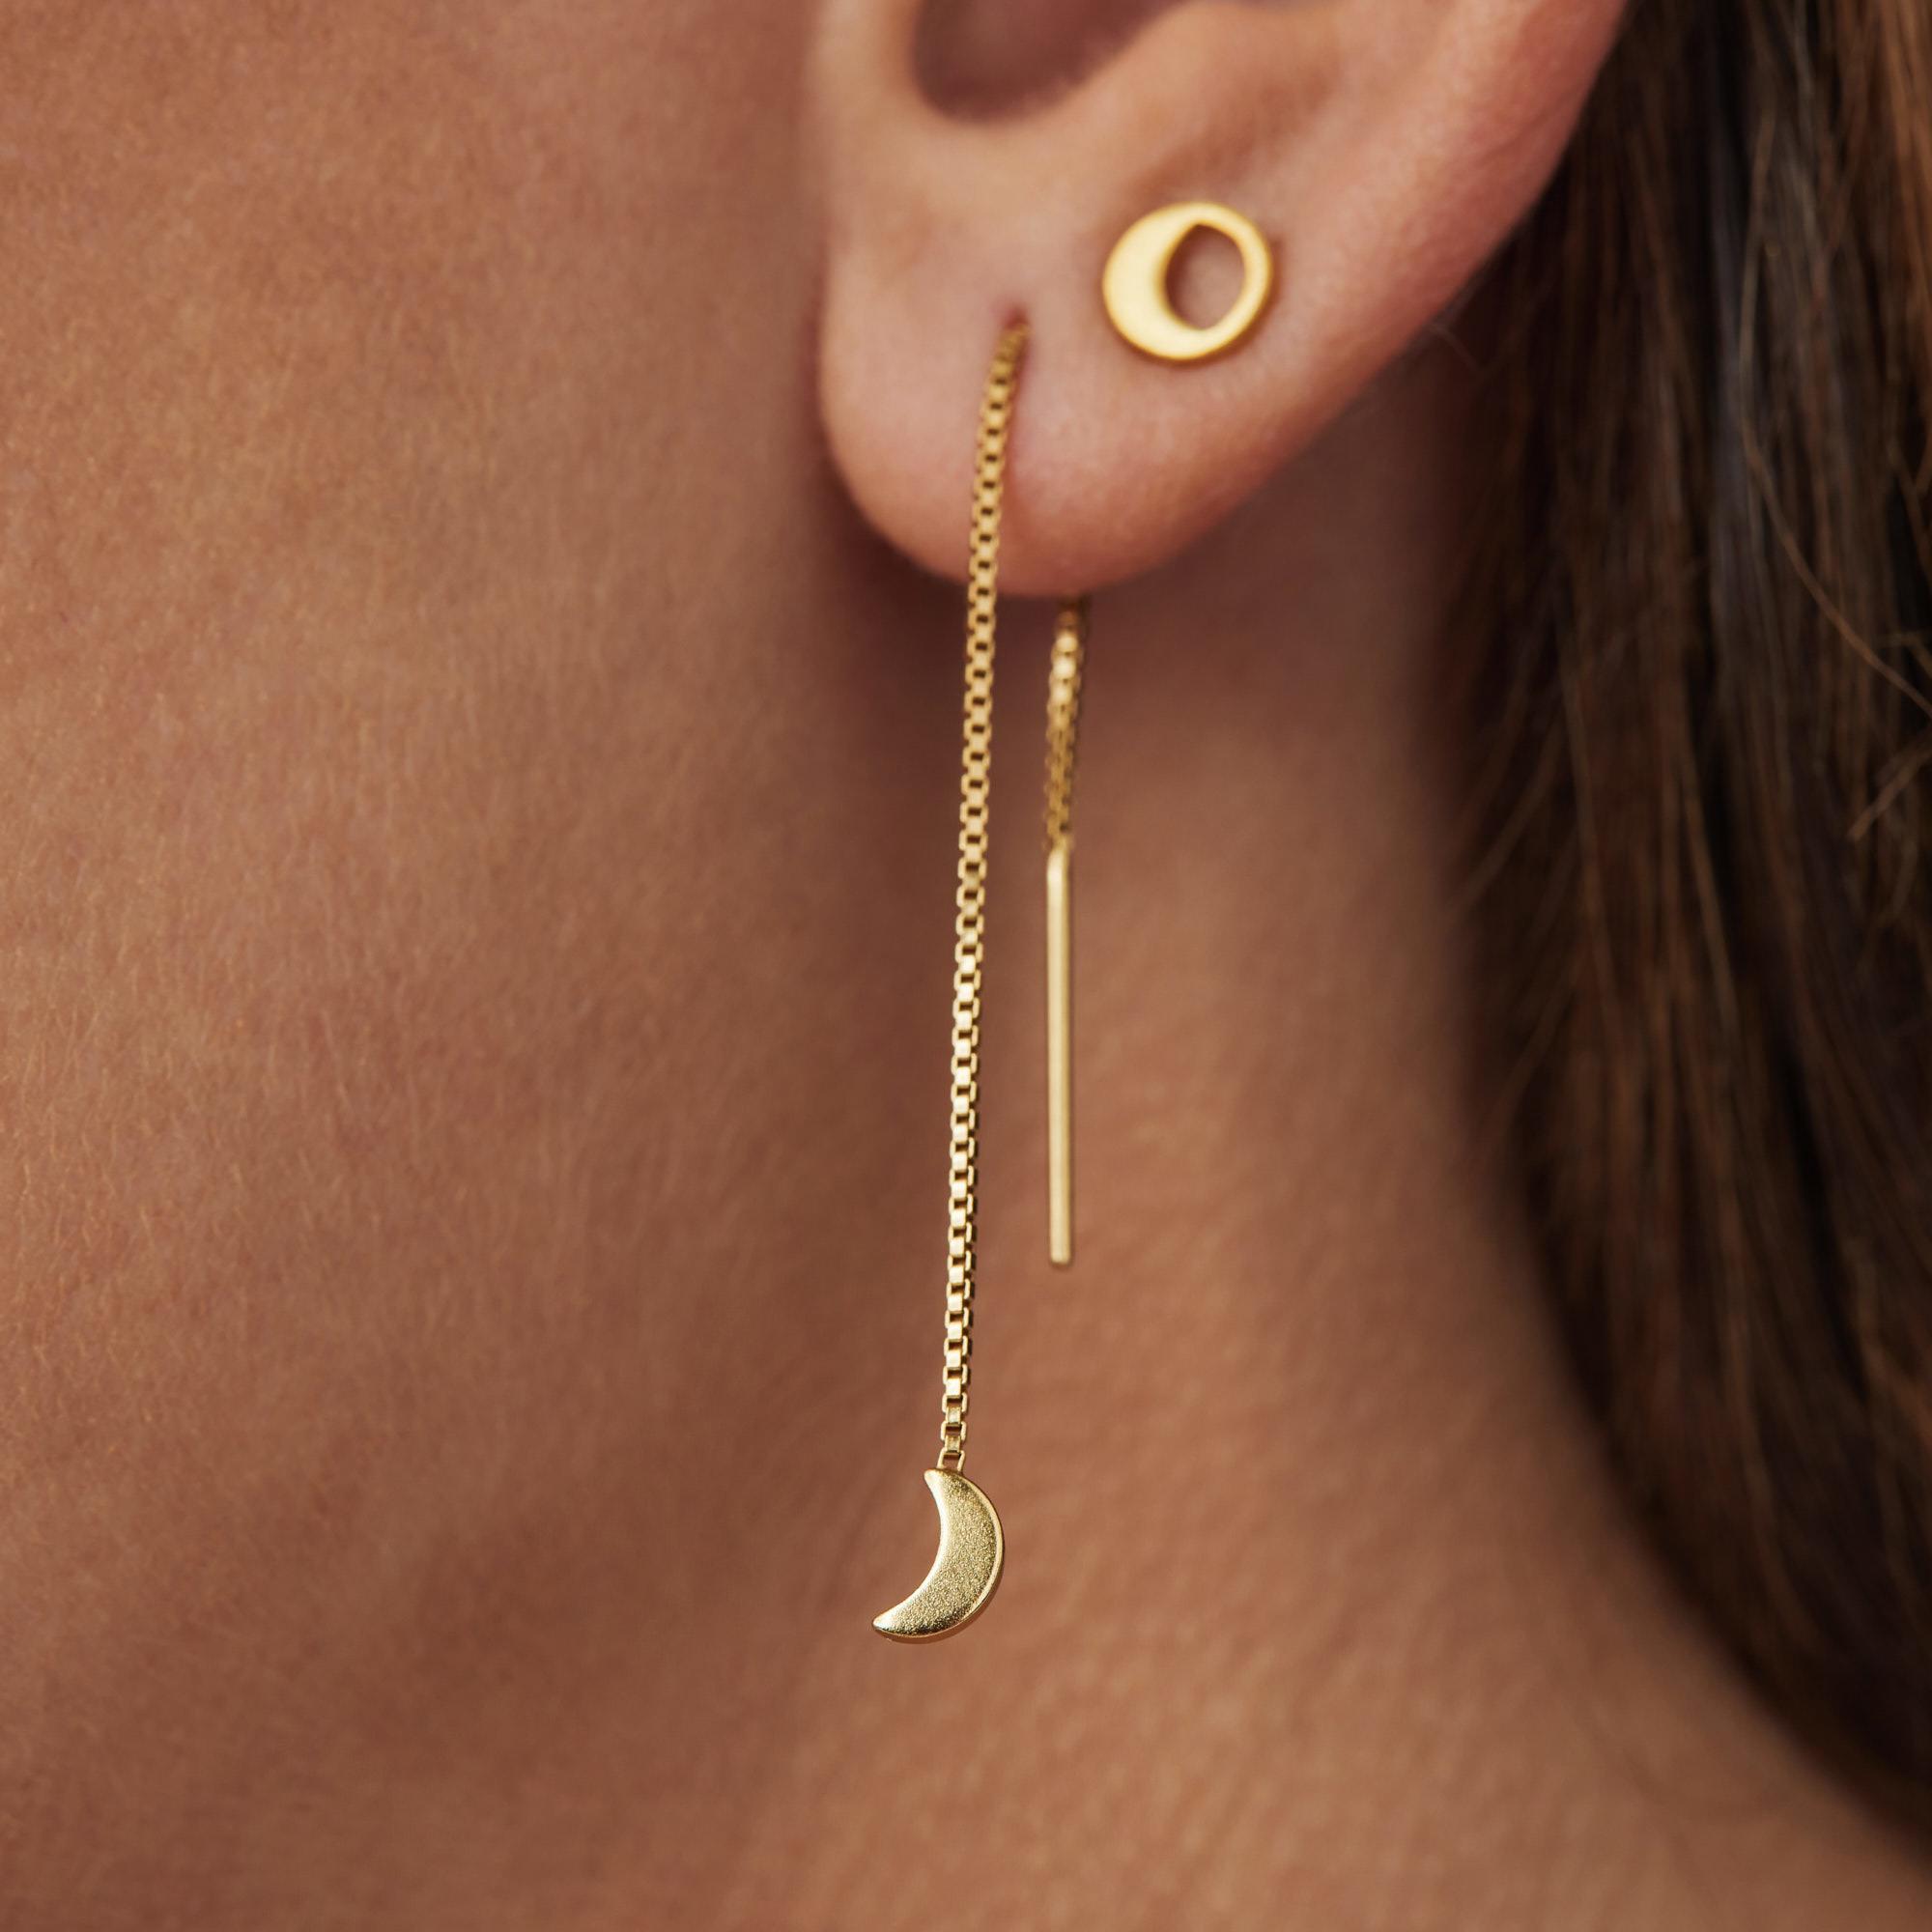 Violet Hamden Luna 925 Sterling Silber goldfarbenes Ohranhänger mit Monde